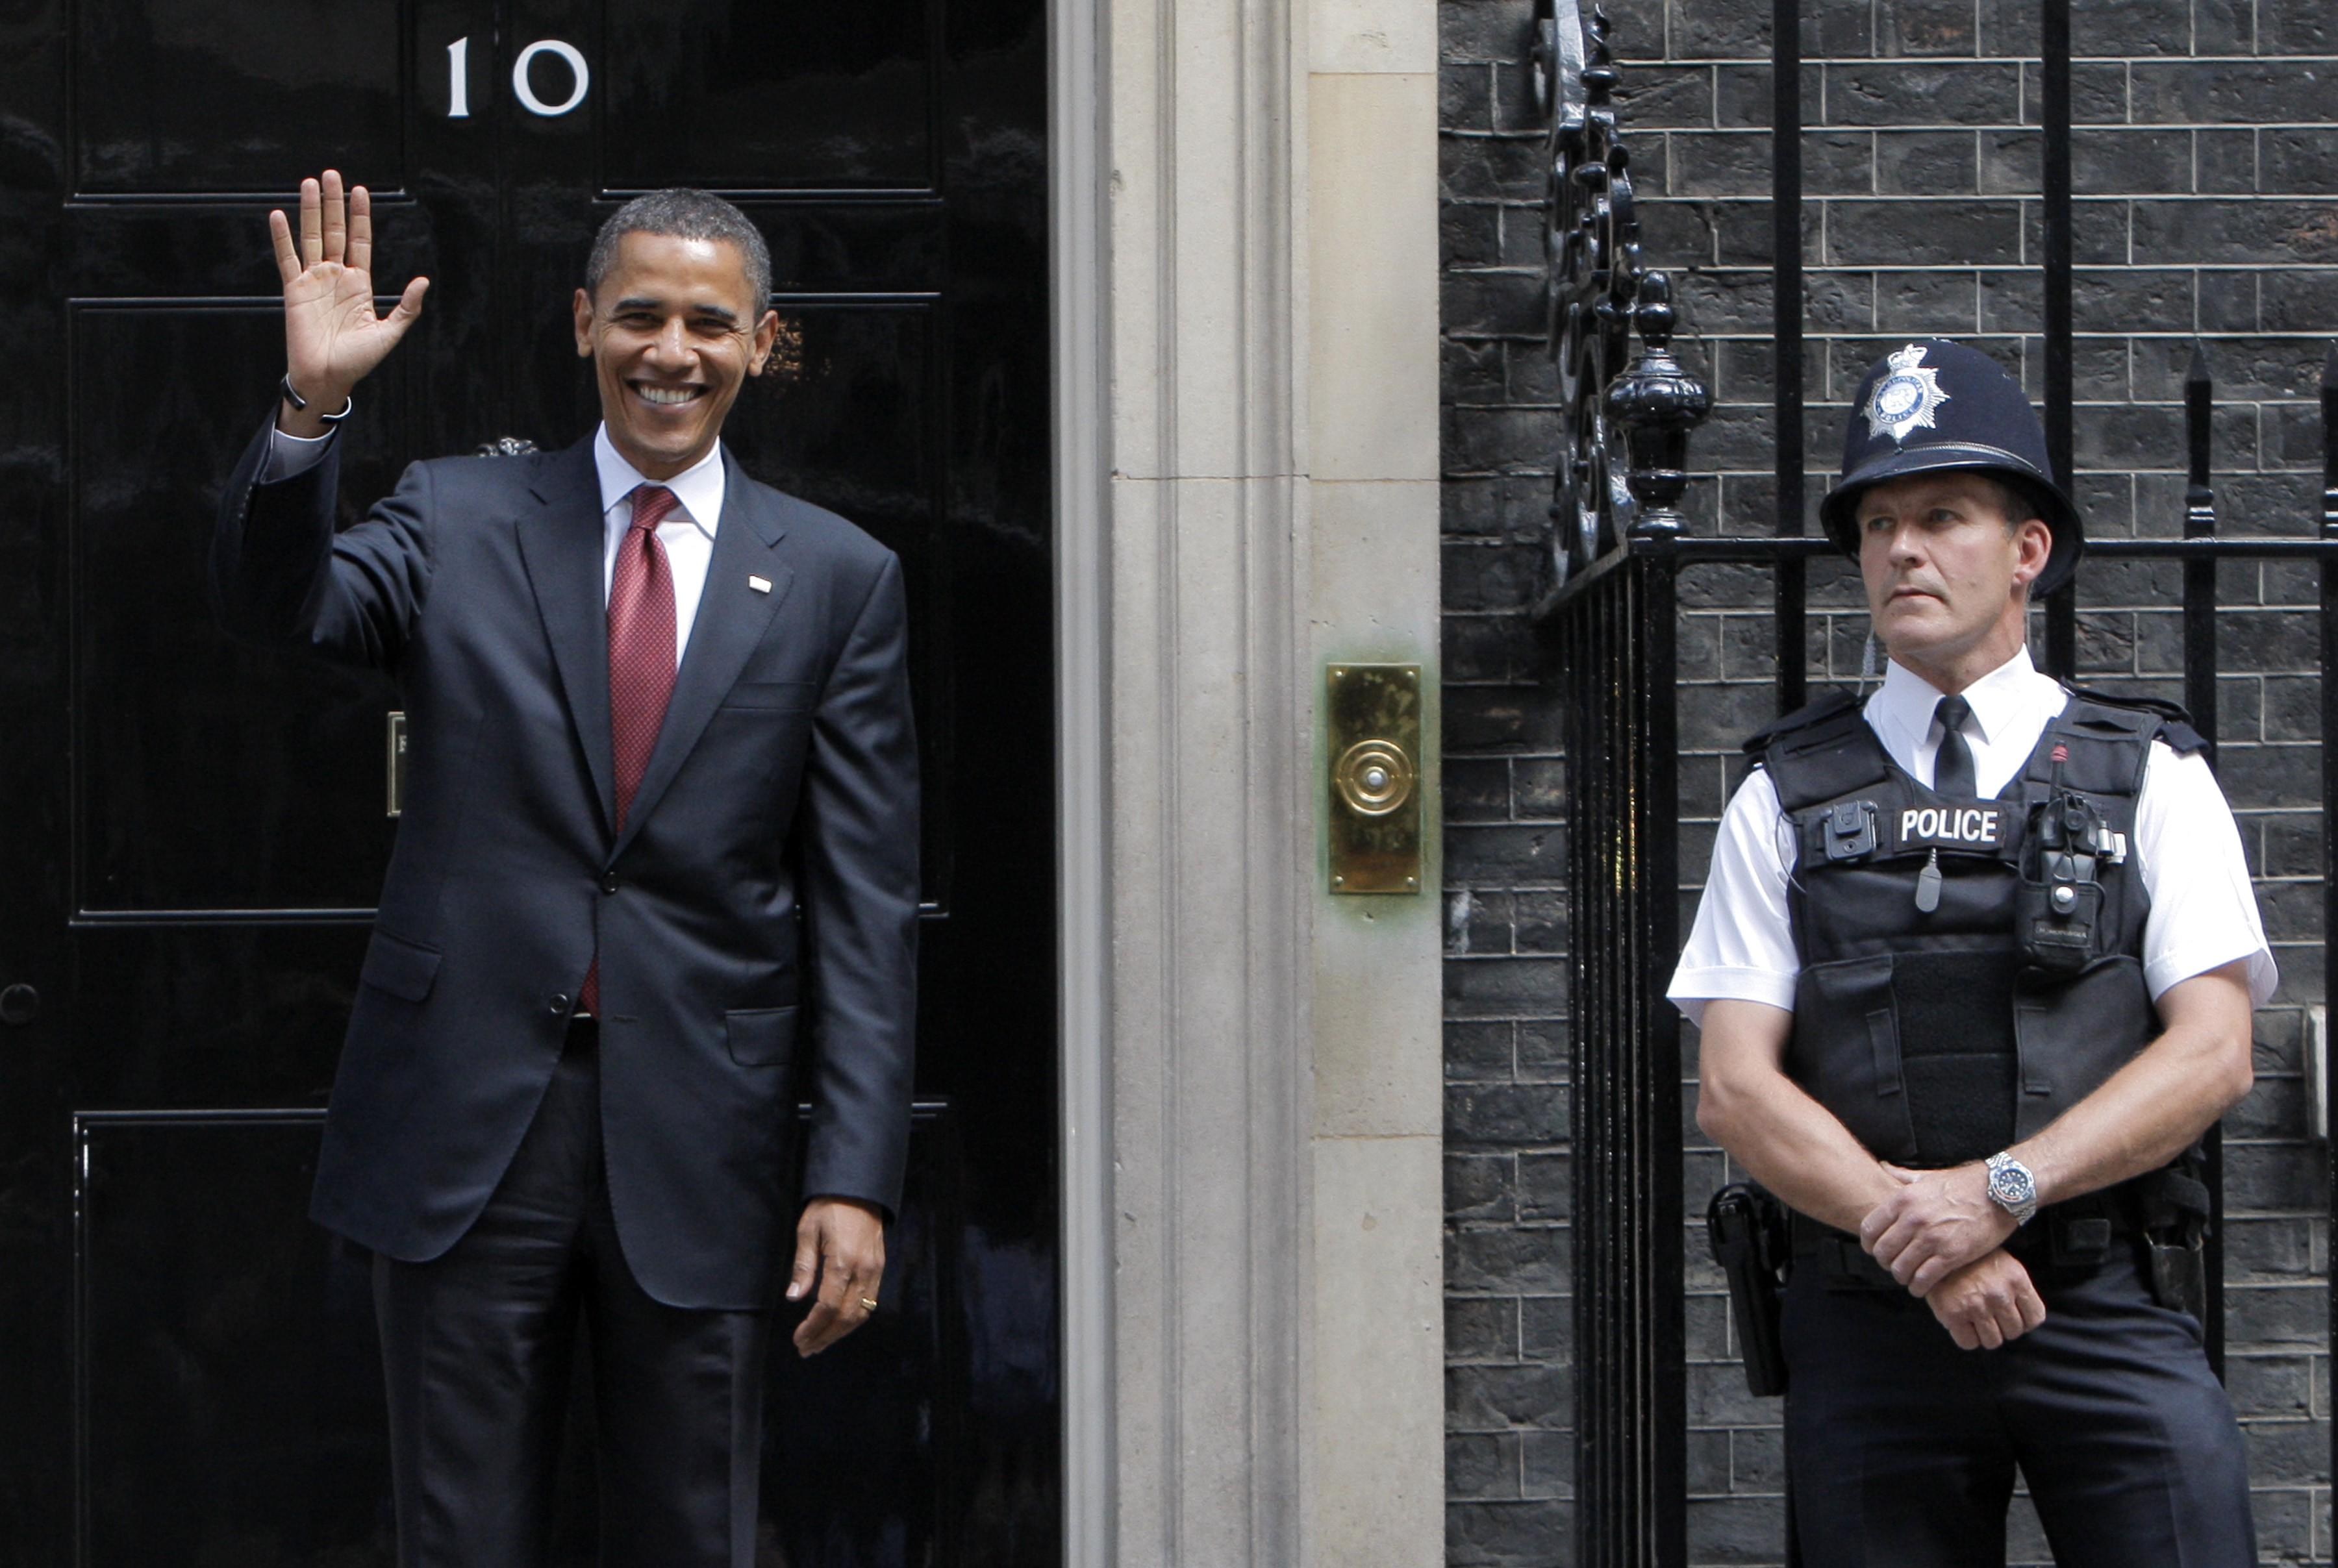 Obama visits Downing St. 2008